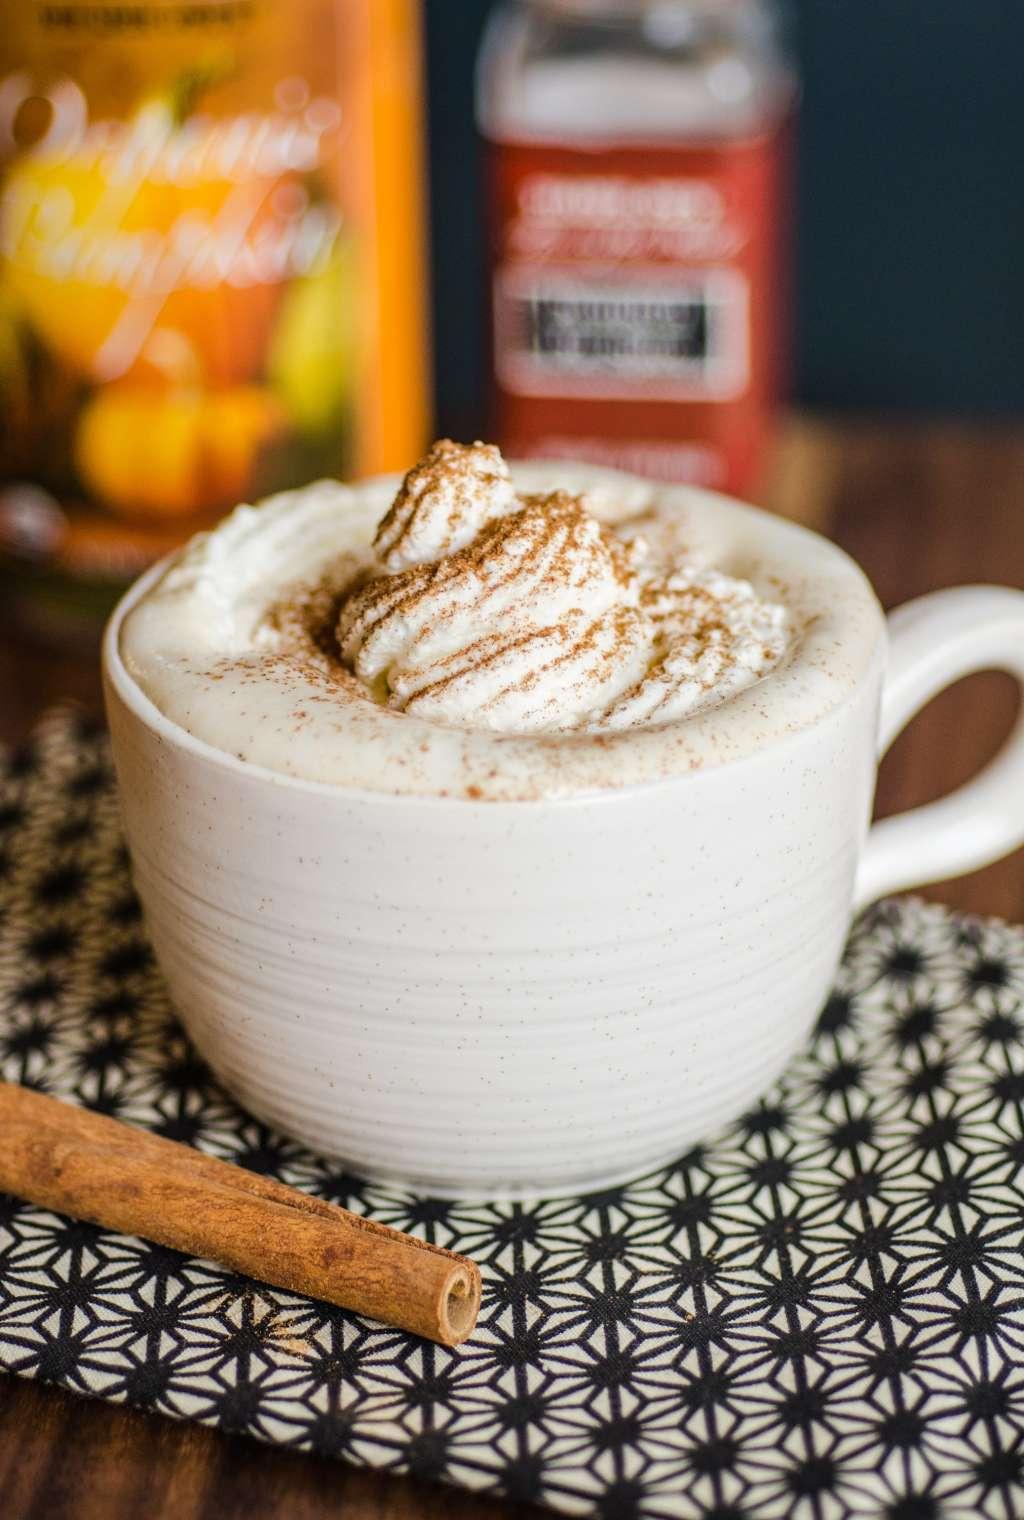 How To Make Pumpkin Spice Lattes, Even Better than Starbucks